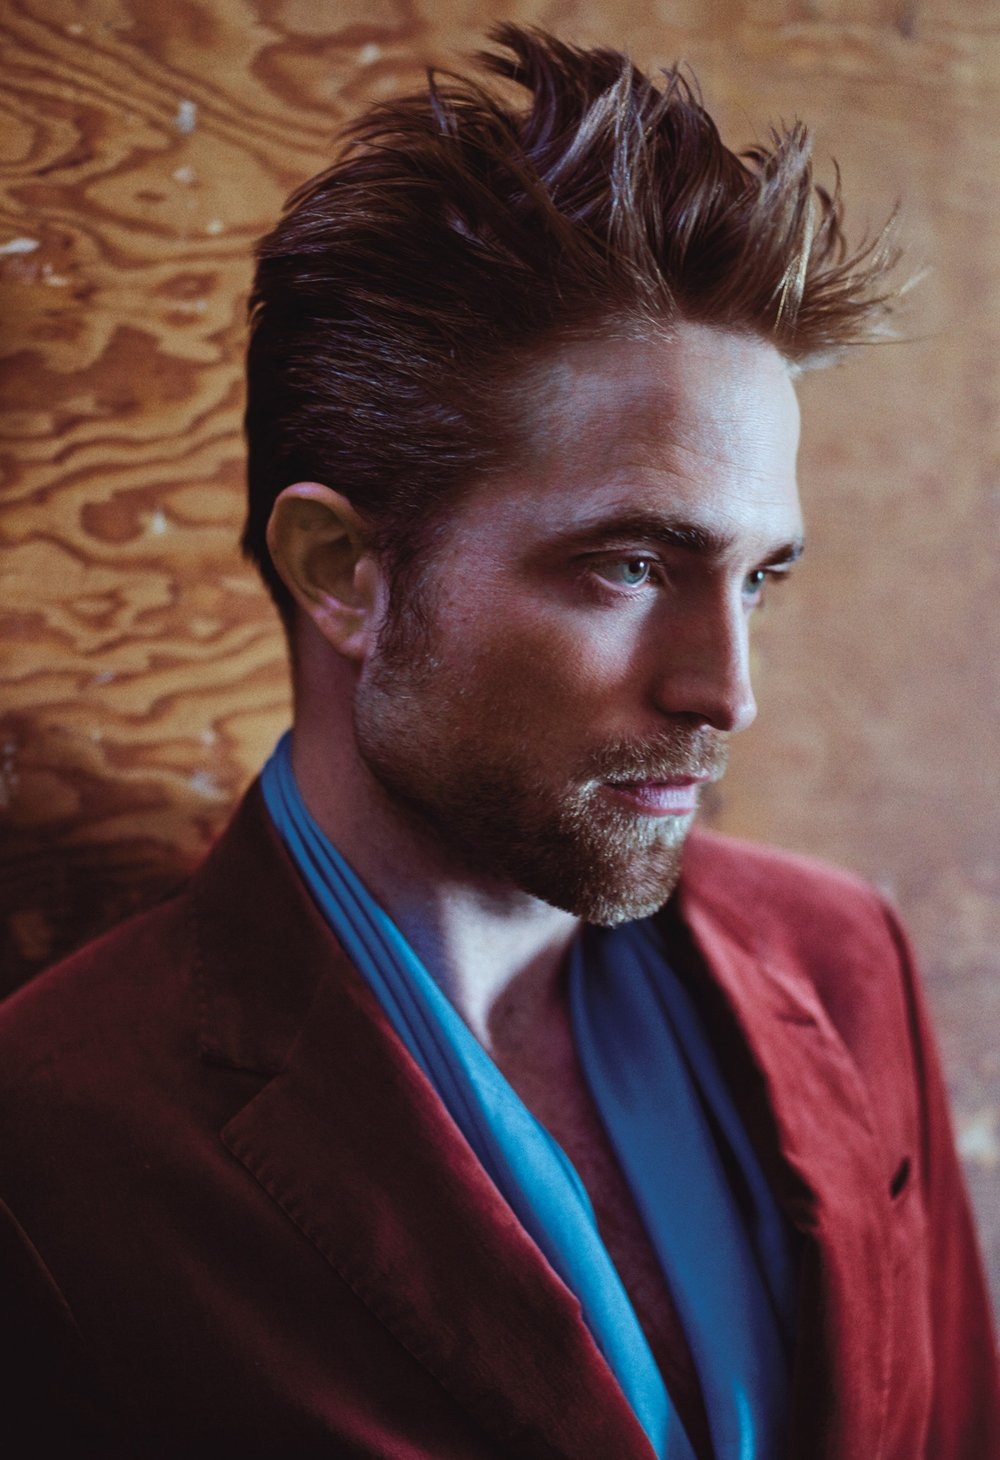 Robert Pattinson </br><small> <i> W Magazine October 2017</i> </br> Photo by Mario Sorrenti</small>